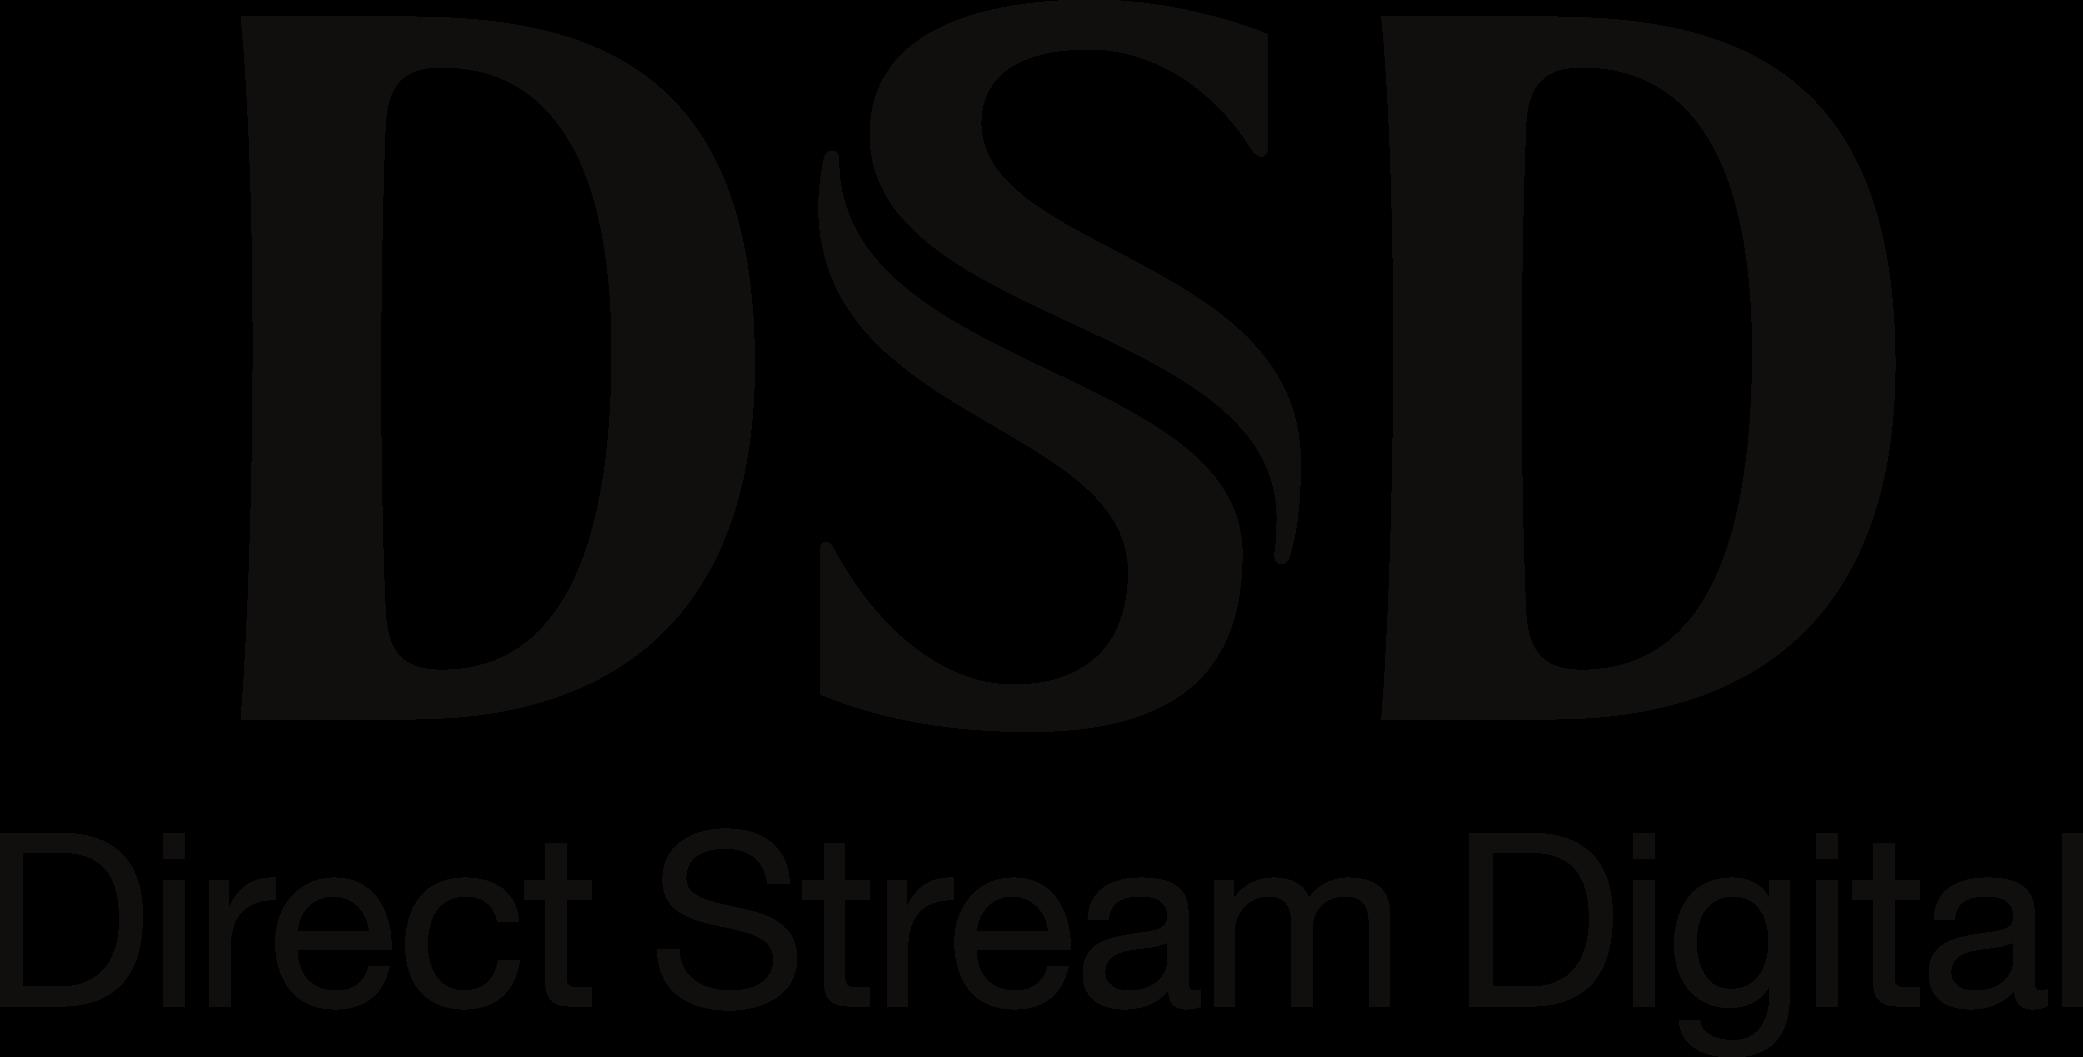 dcc1600ne-DSDlogo_011116105807